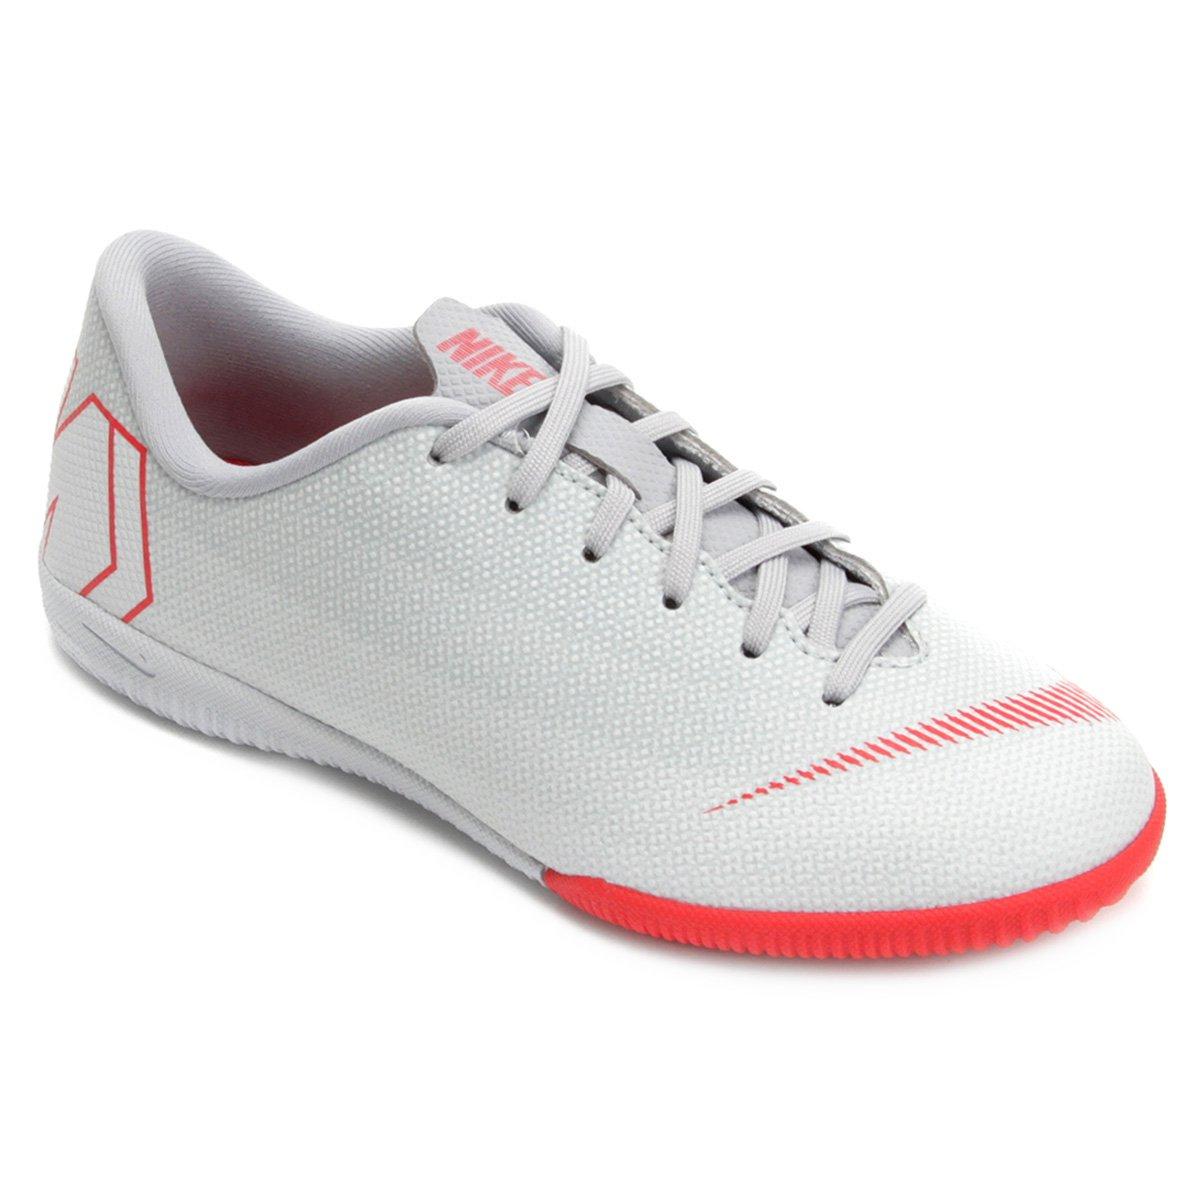 f9c94ef272315 Chuteira Futsal Infantil Nike Mercurial Vapor 12 Academy GS IC - Tam ...